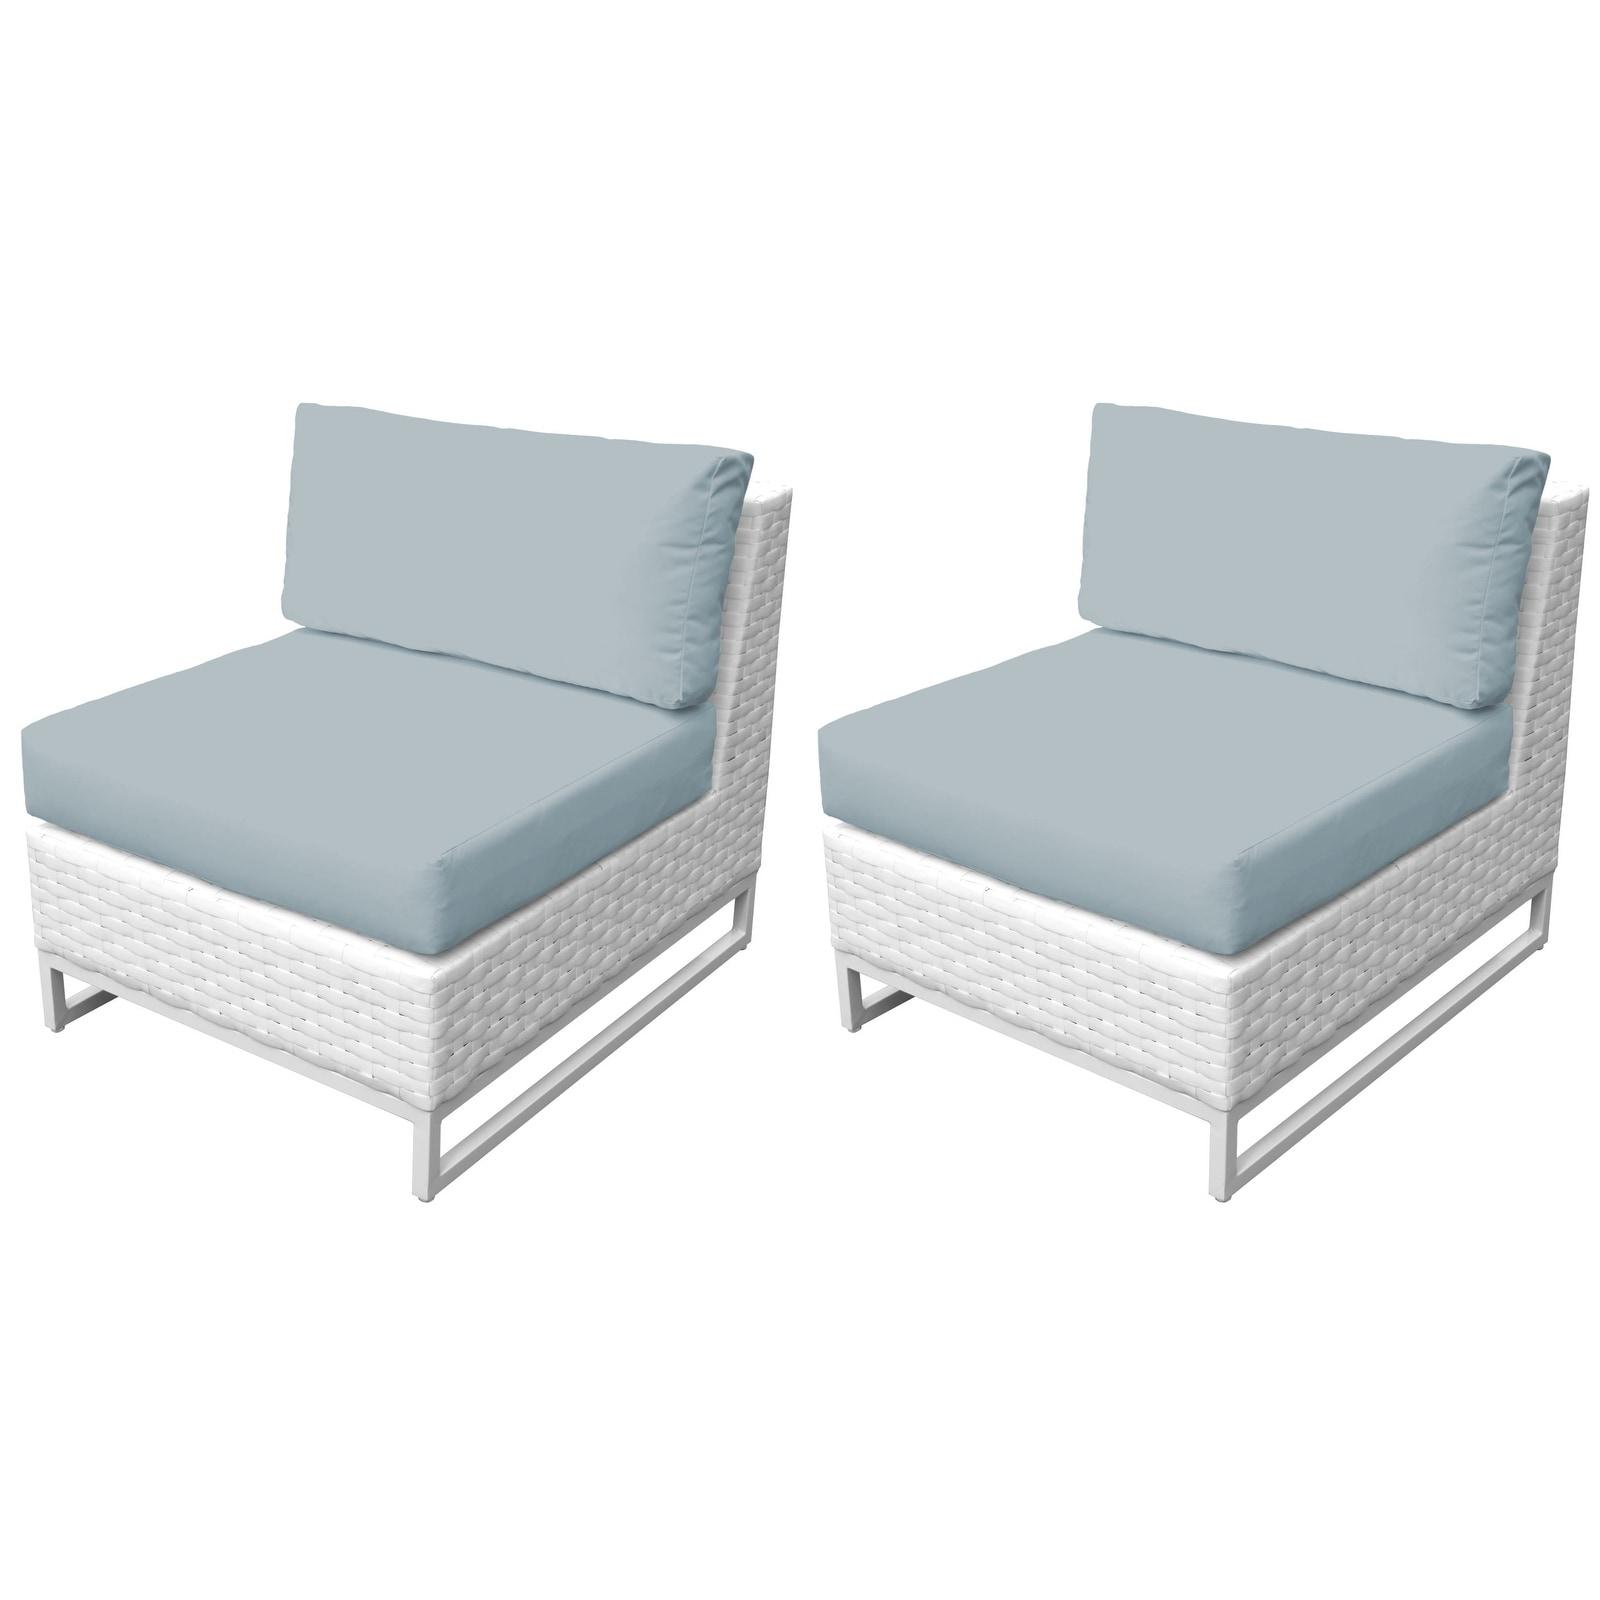 Shop tk classics miami wicker and aluminum outdoor armless sofa set of 2 free shipping today overstock com 24018237